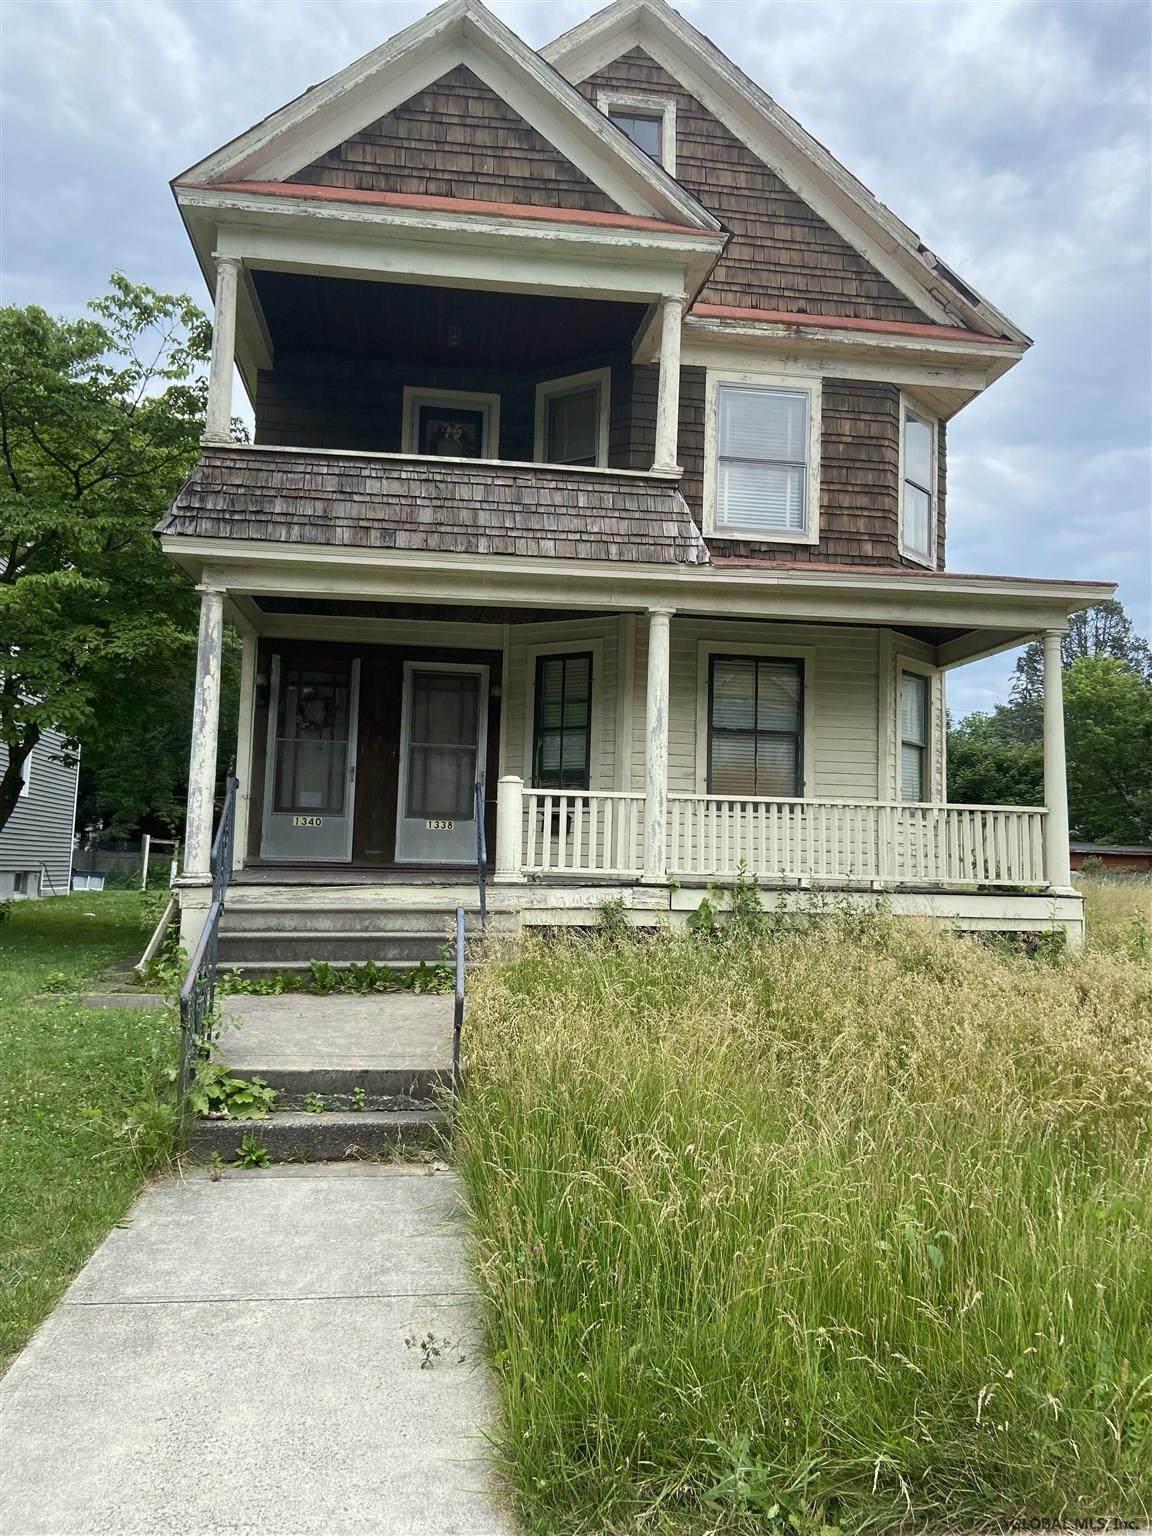 1338-1340 Parkwood Blvd - Photo 1